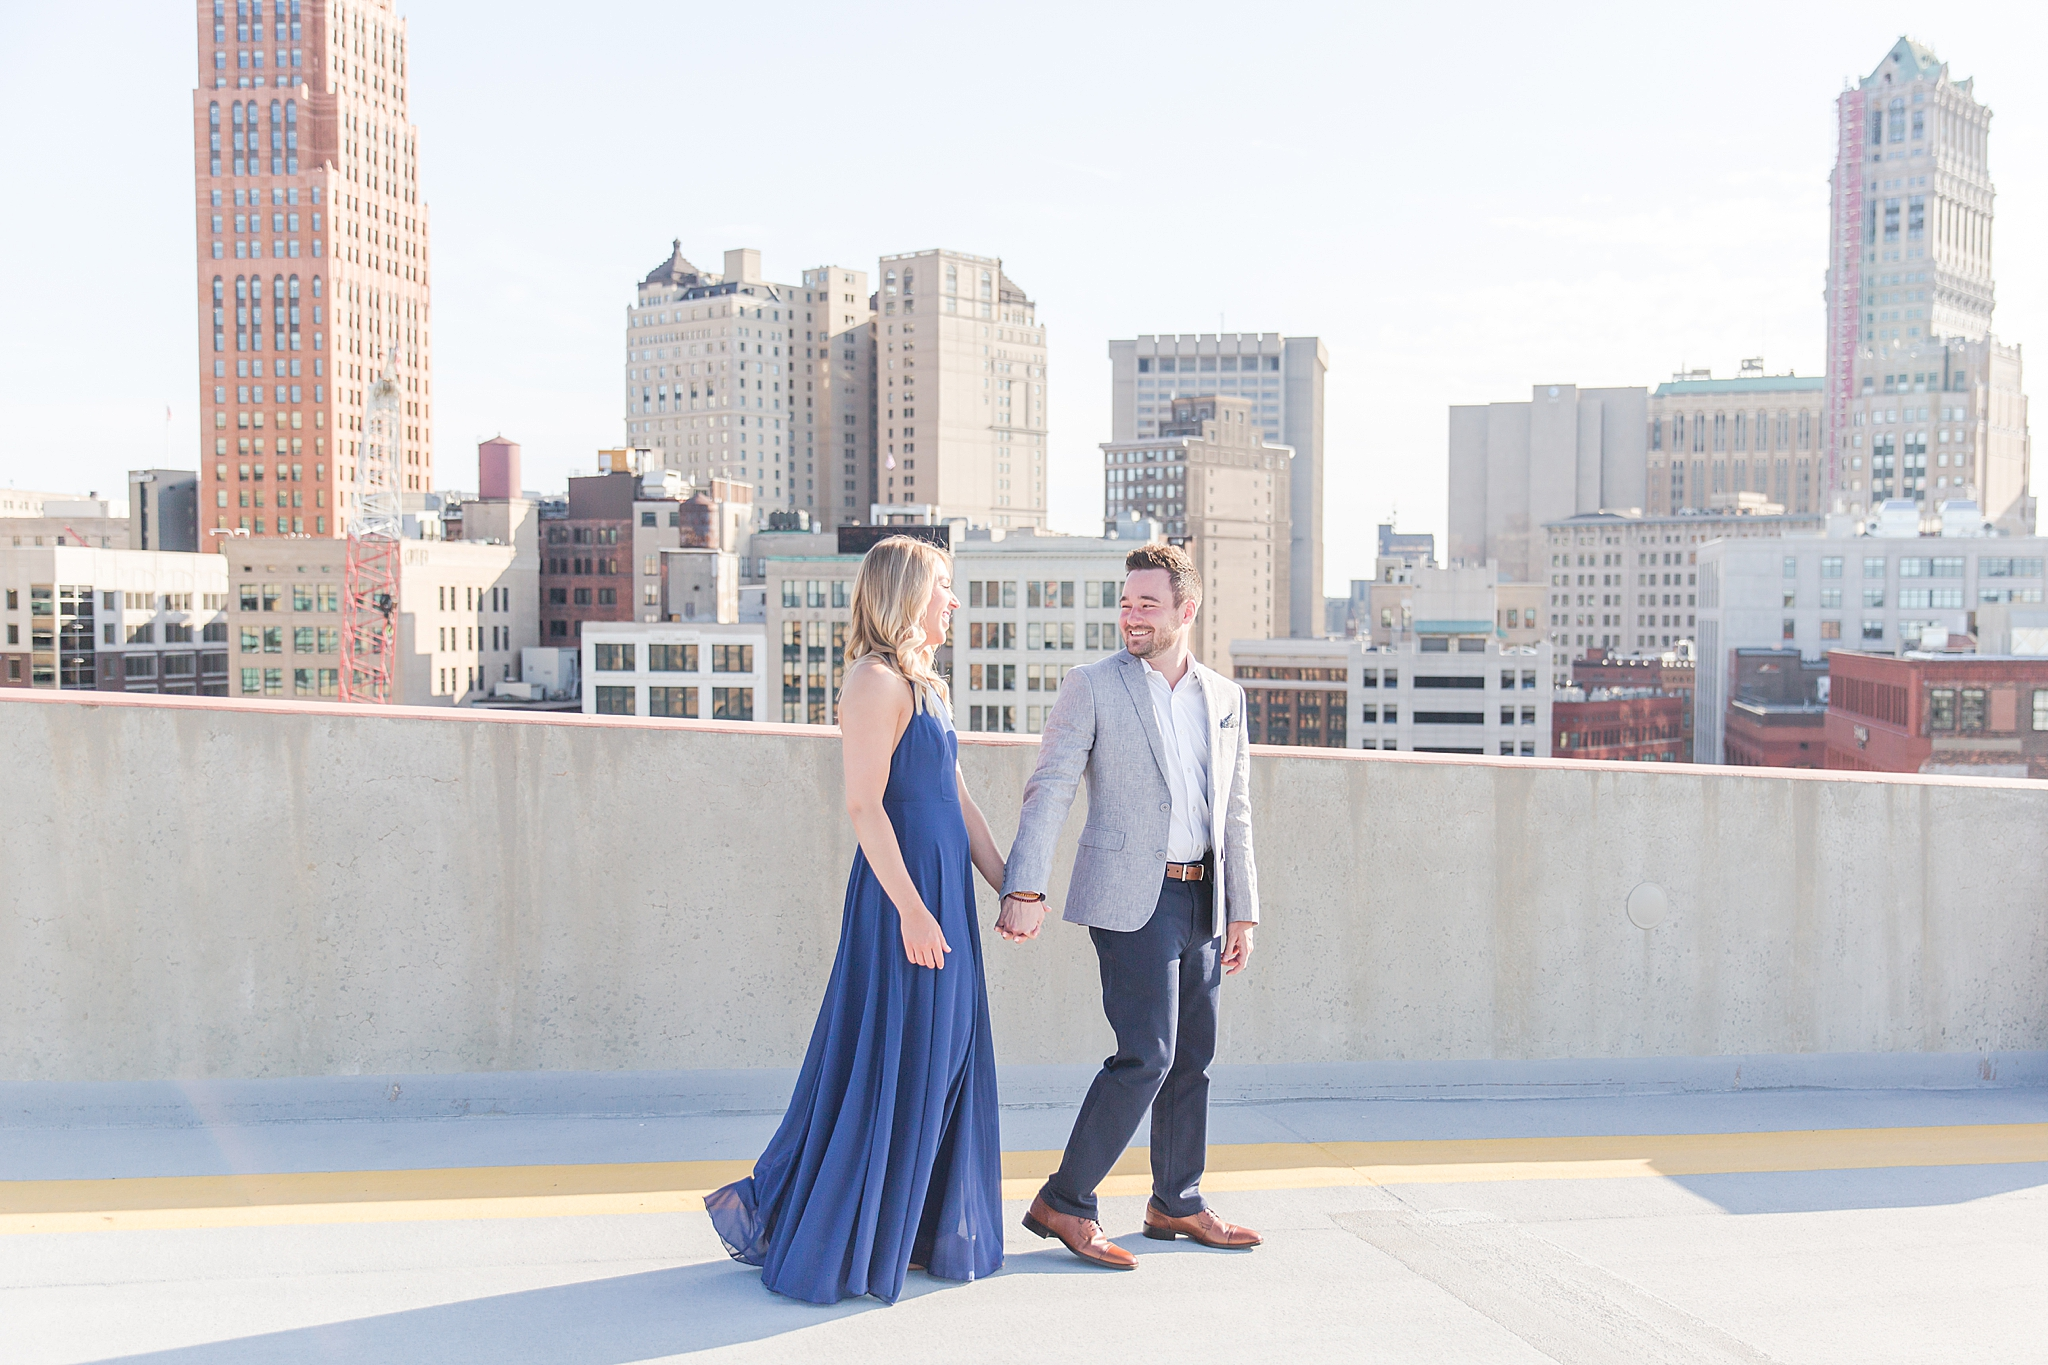 detroit-wedding-photographer-downtown-detroit-belle-isle-engagement-photos-sarah-eric-by-courtney-carolyn-photography_0005.jpg